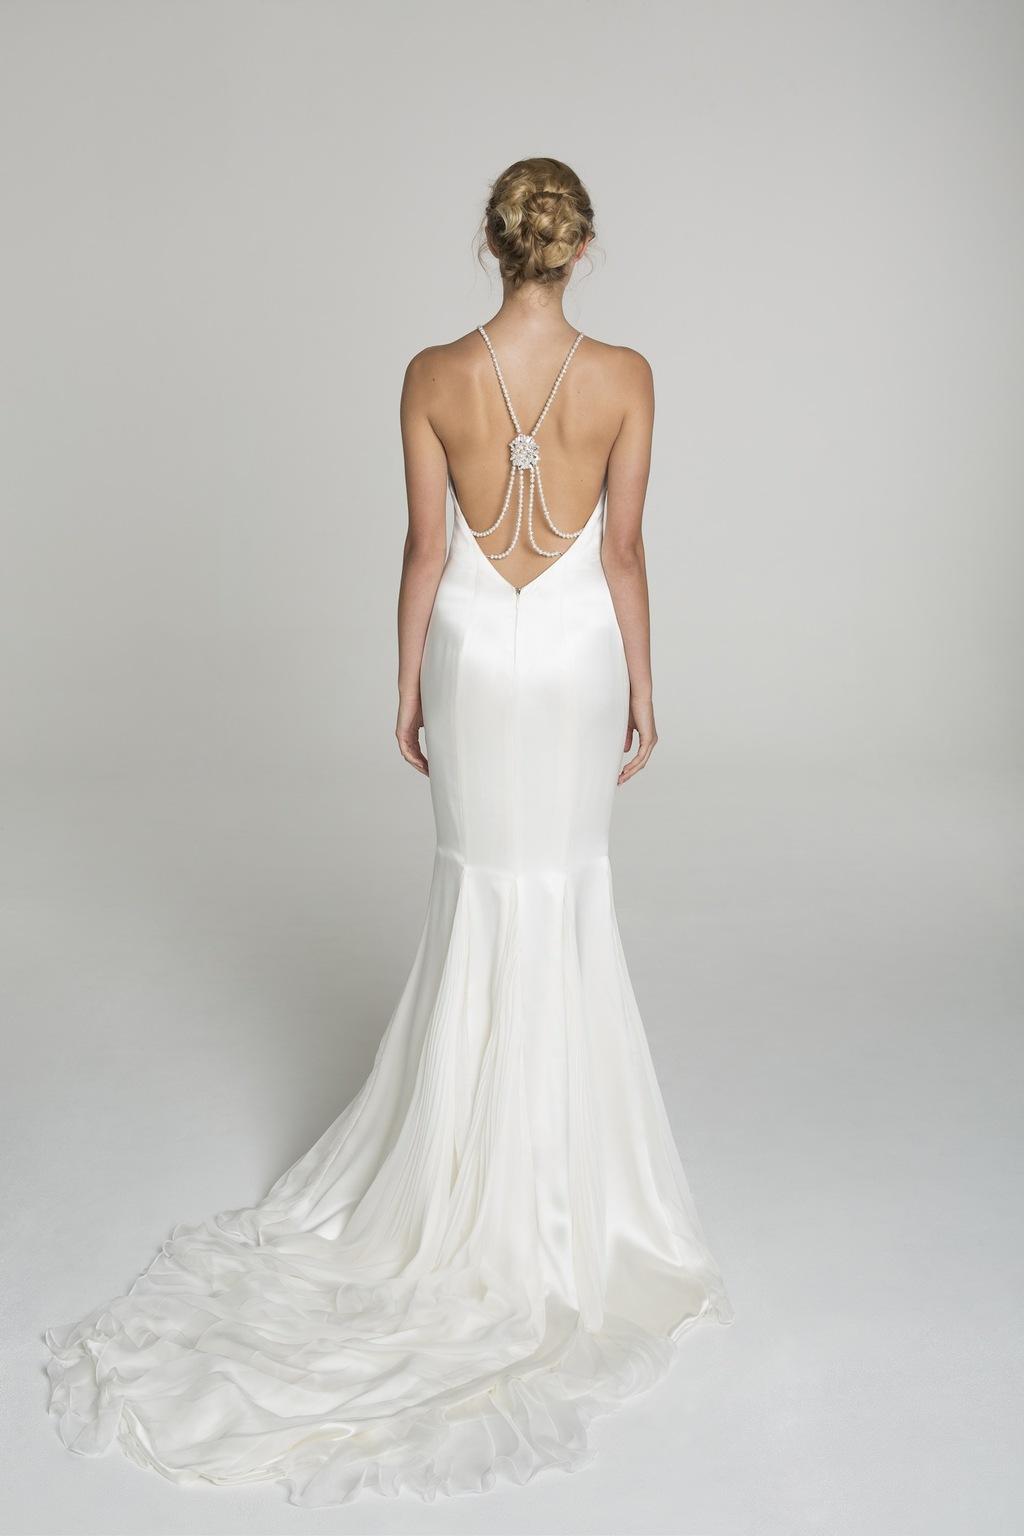 Wedding Dresses With High Neck : High neck wedding dress from alana aoun onewed